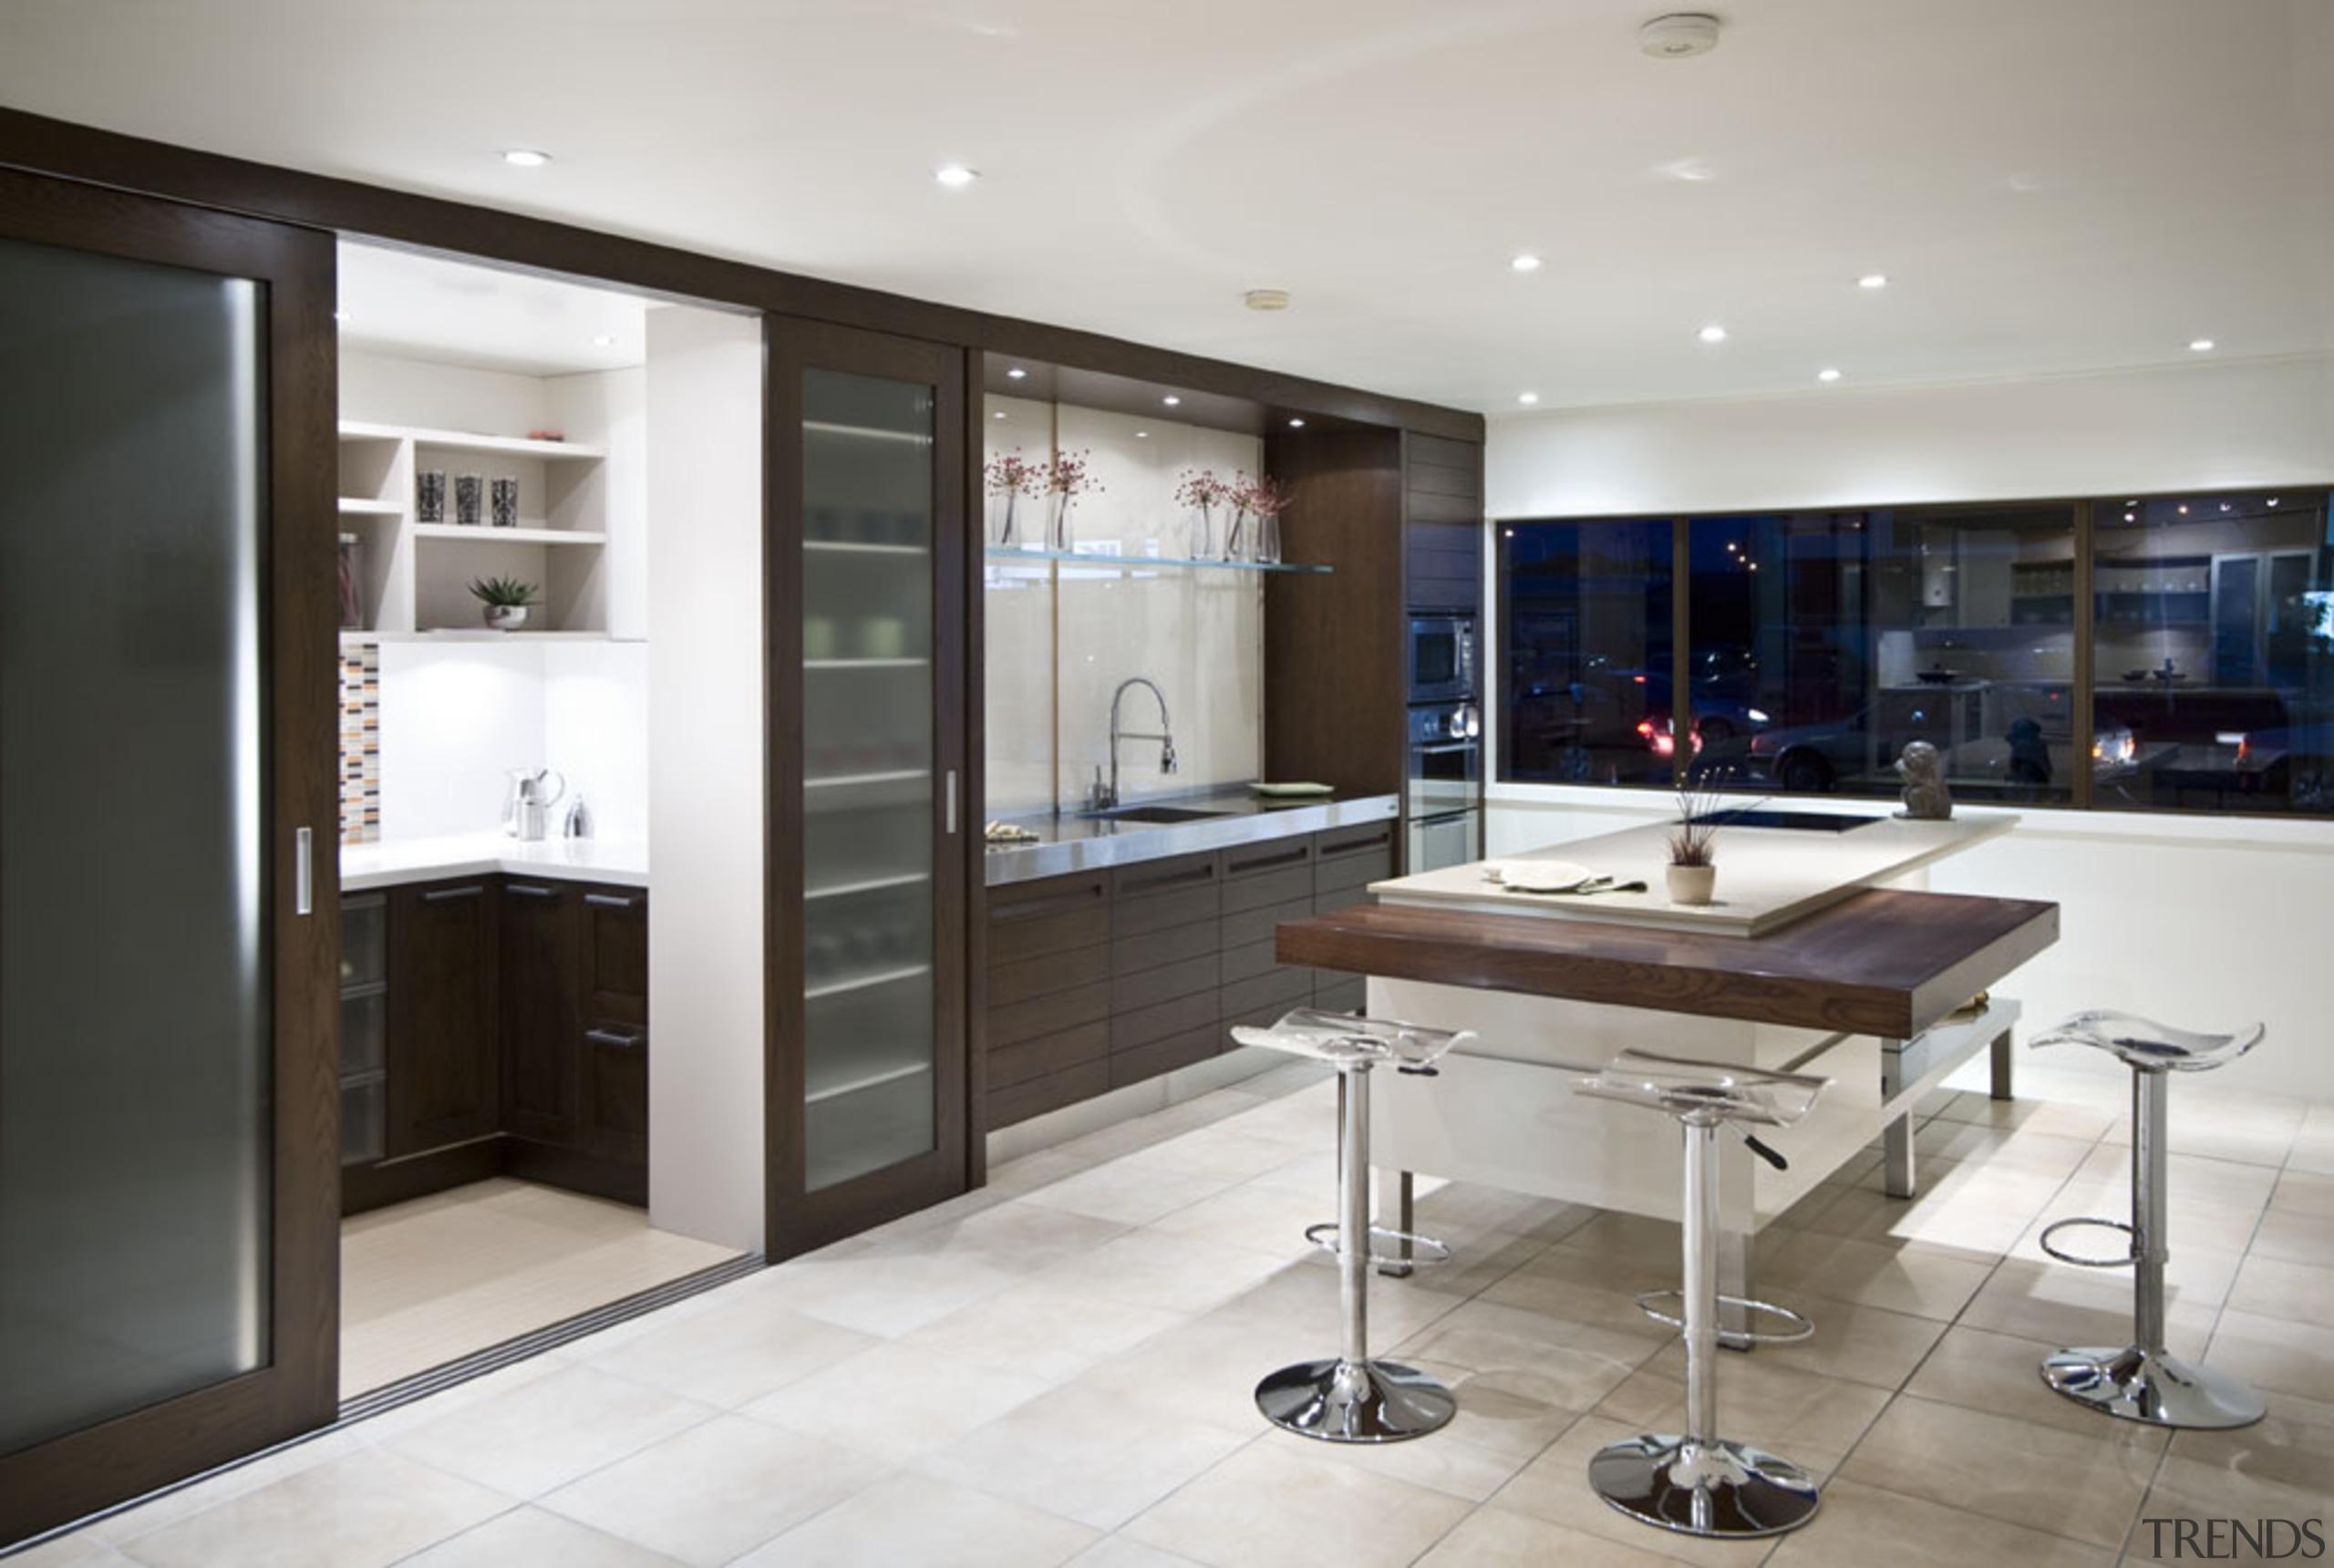 Greenlane - cabinetry | countertop | interior design cabinetry, countertop, interior design, kitchen, room, gray, black